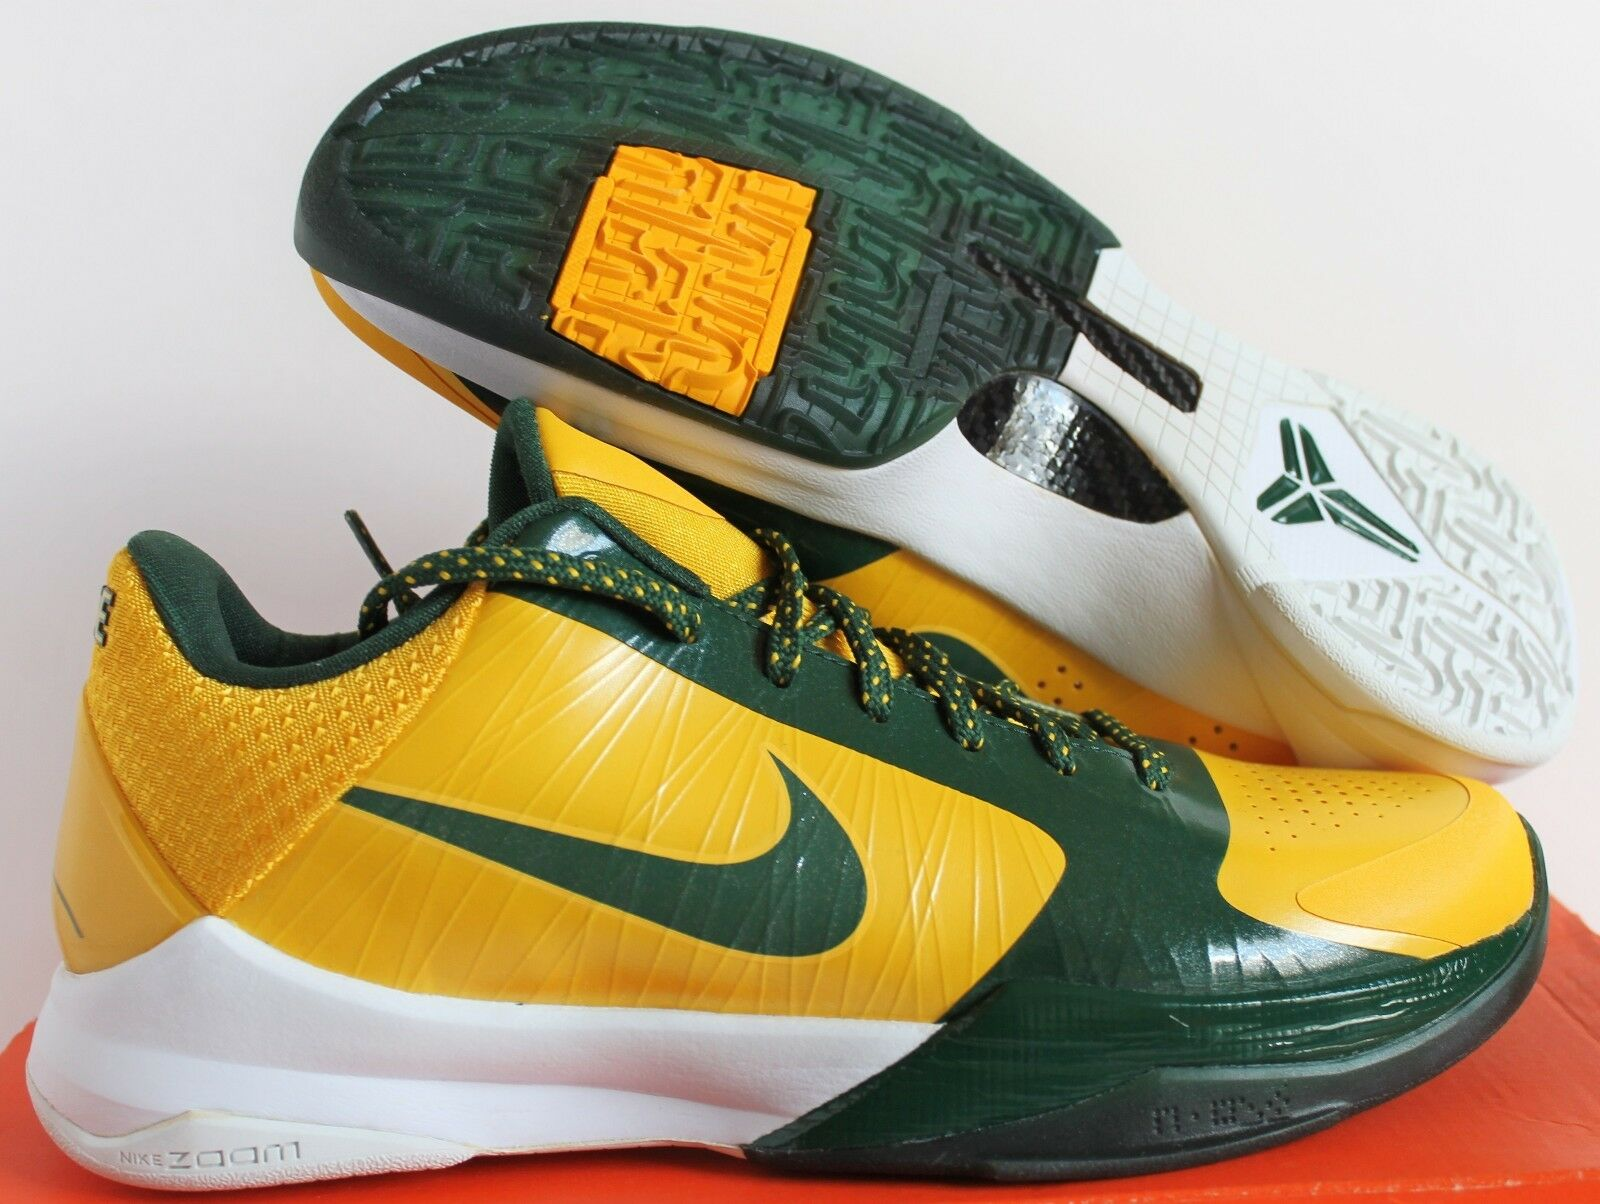 Nike 2009 Zoom Kobe V 5 Rice School High School Rice Edition Maize sz 8.5 Rare  [386429-700] 023575